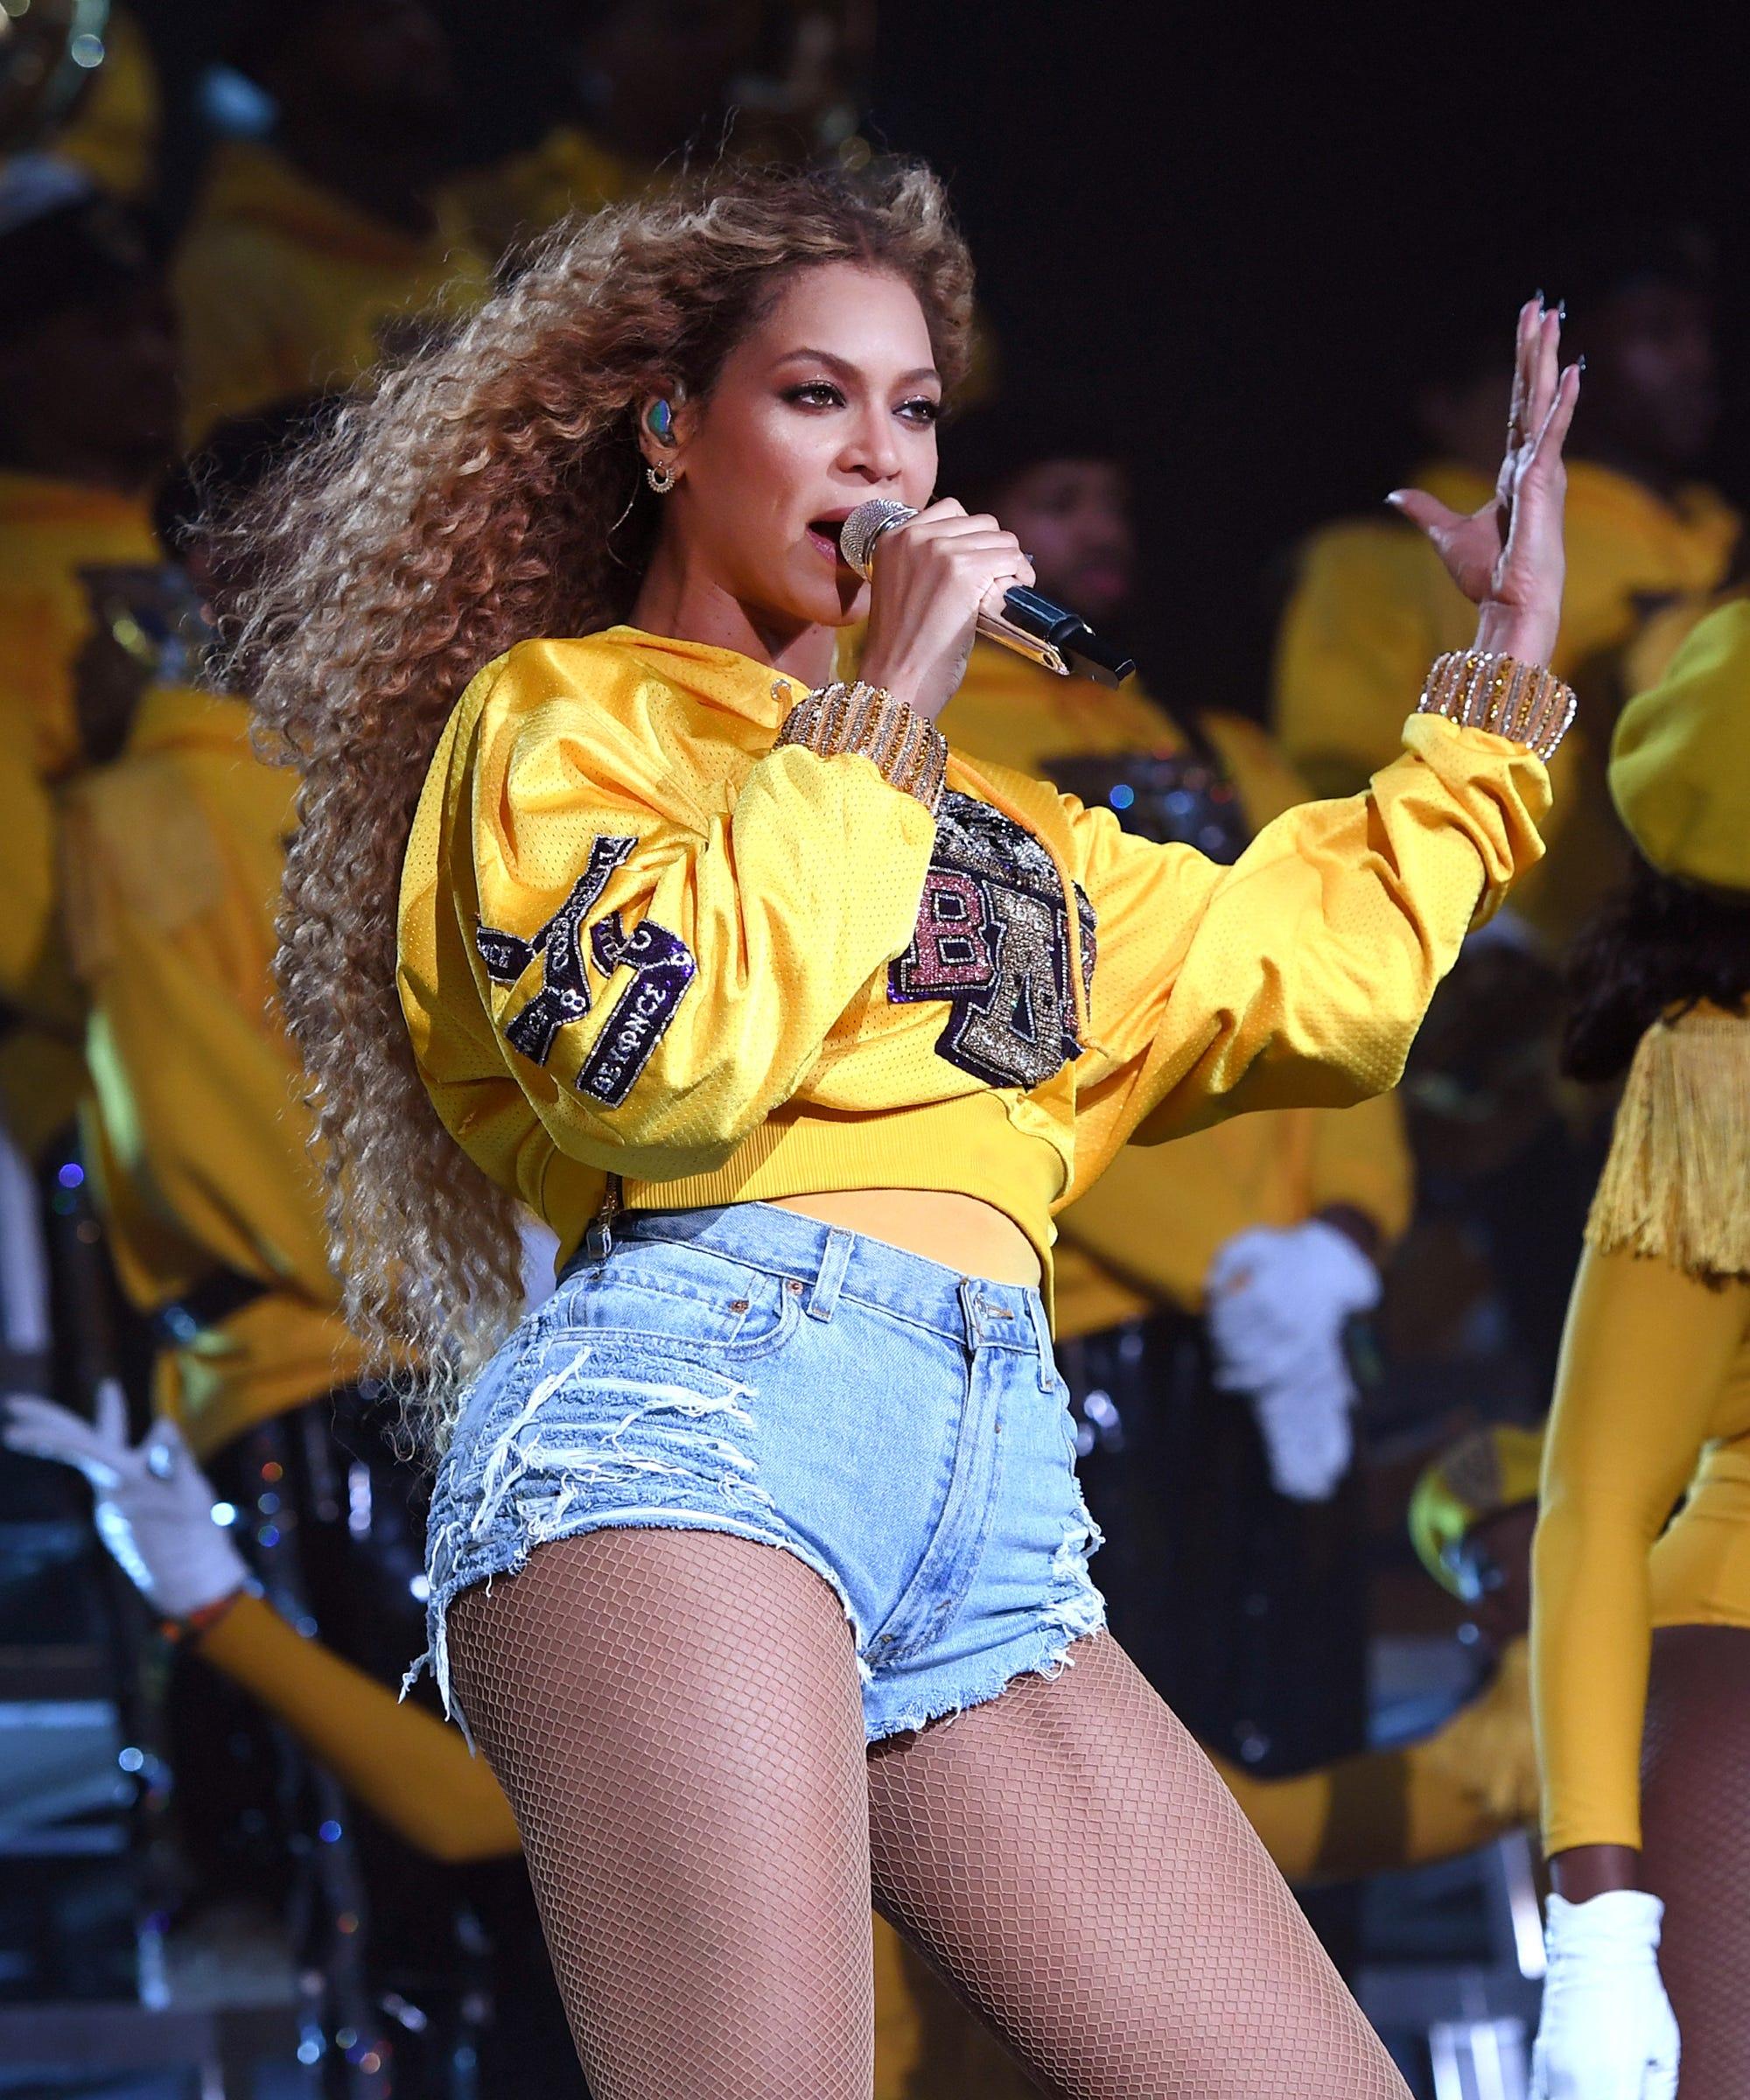 Beyoncé's Makeup Artist Shares The Secrets Behind Her Glowing Coachella Look